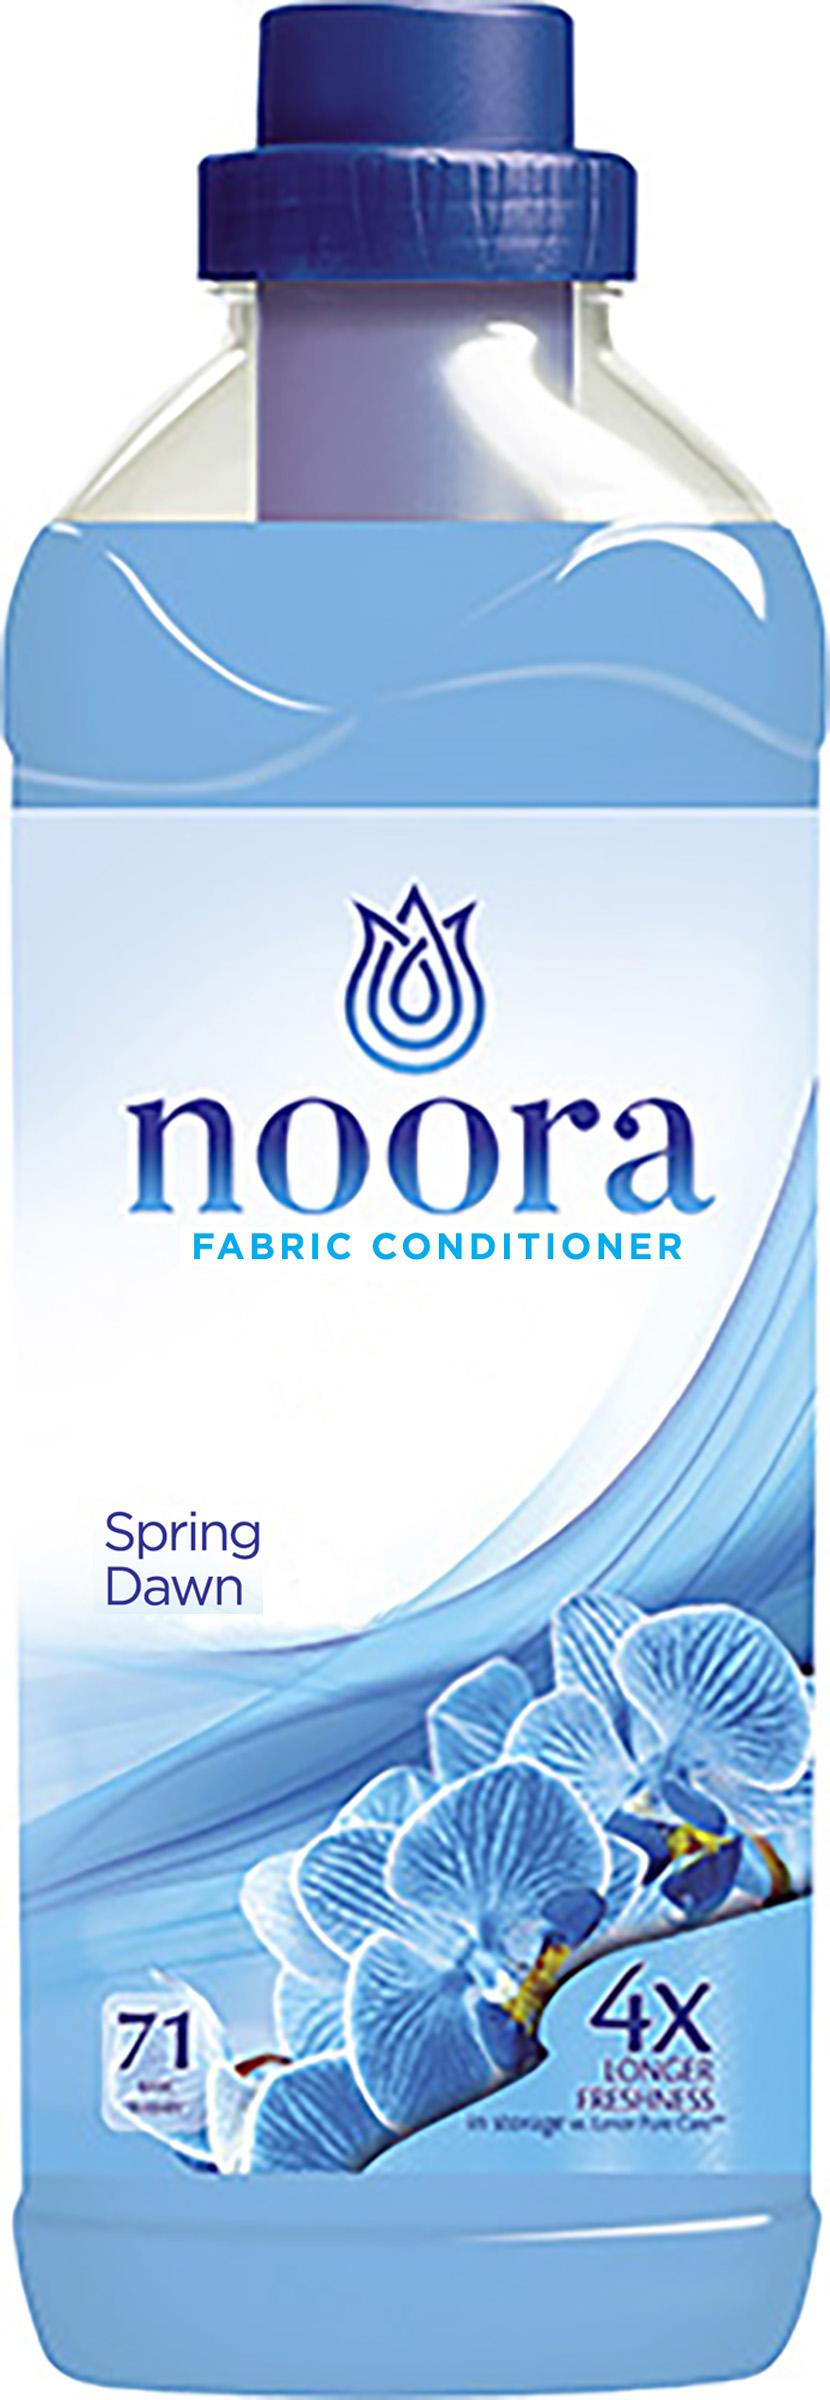 50528 Noora Spring Dawn 1L